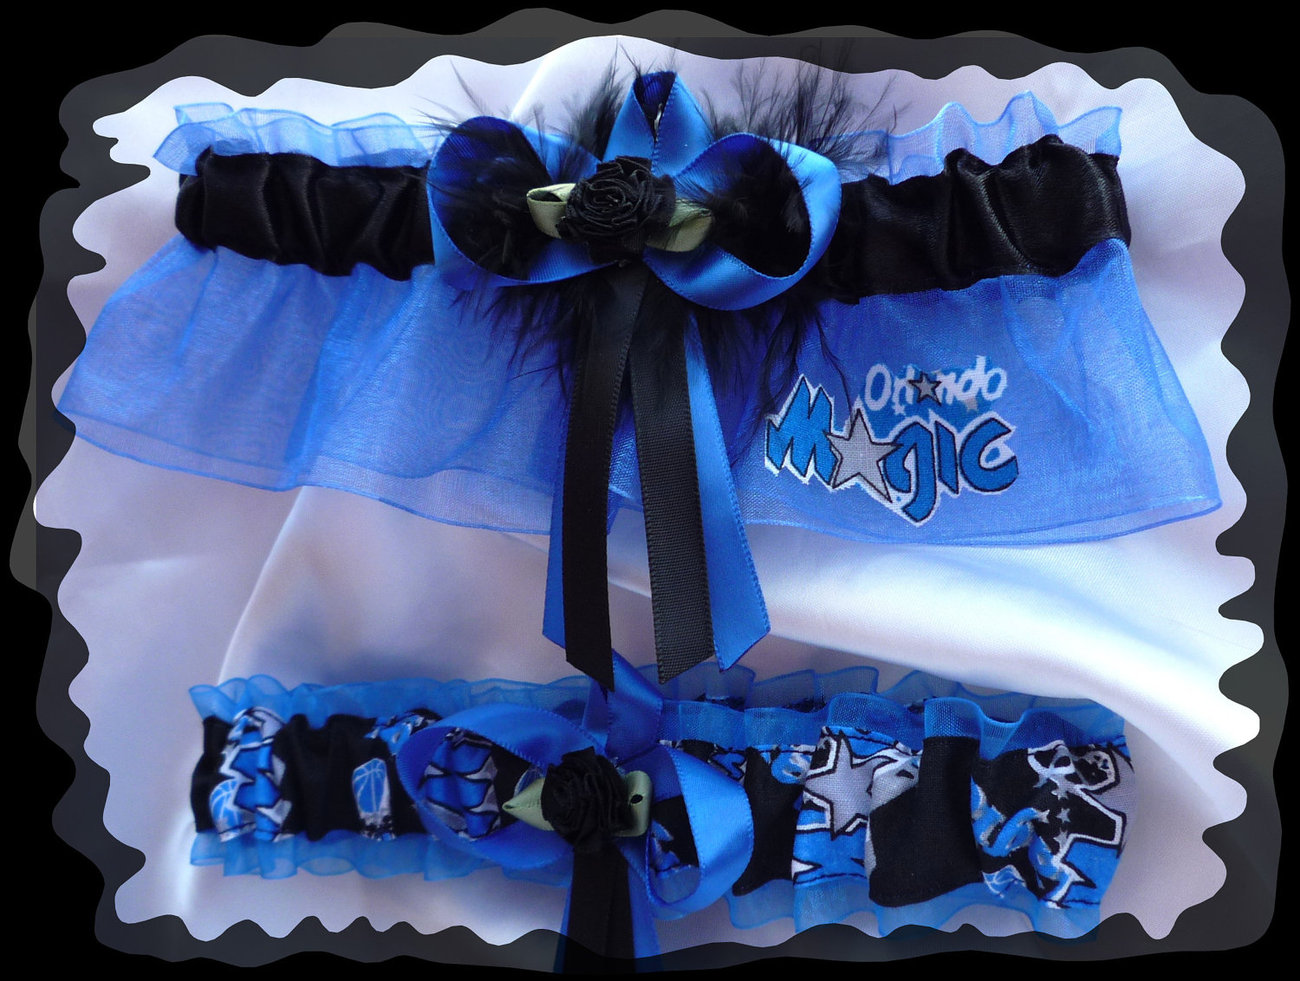 Orlando Magic Blue NBA Fabric Wedding Garter Set BB